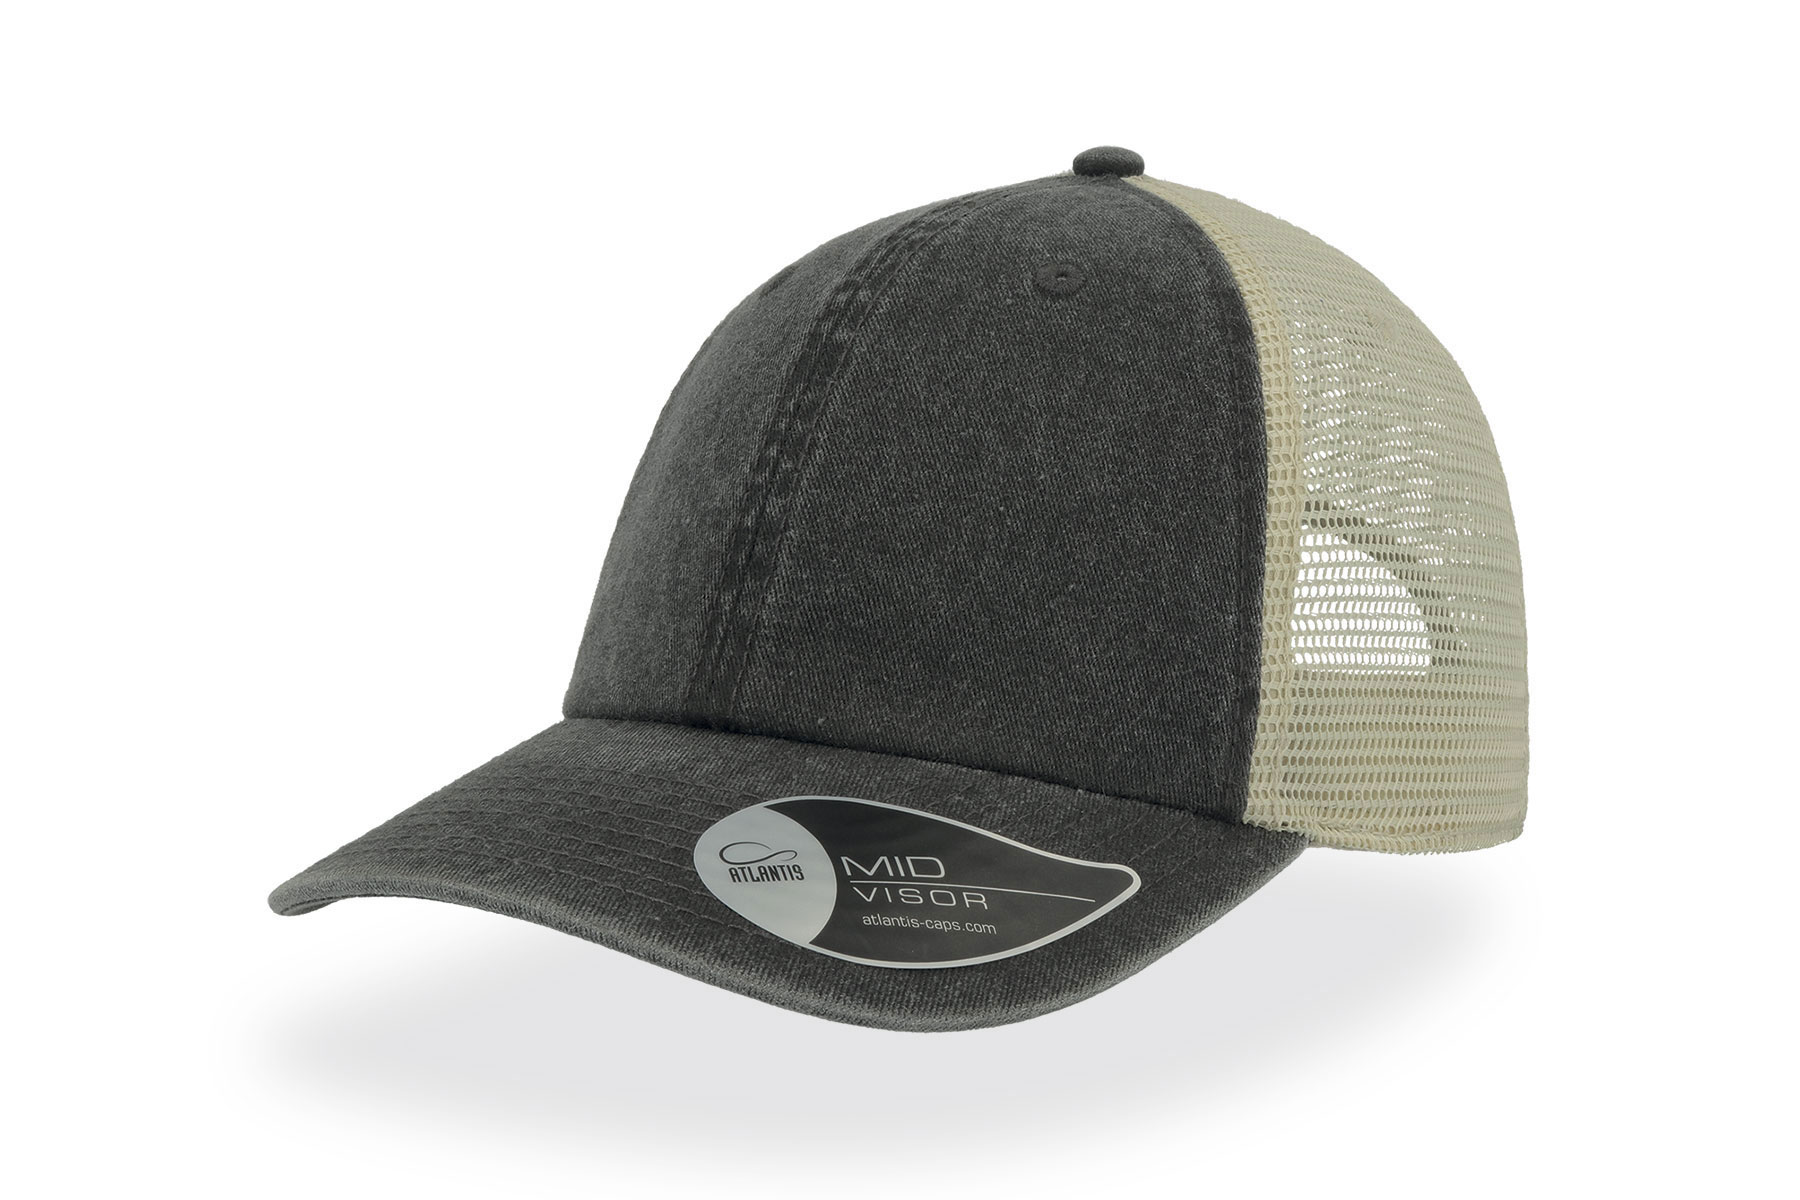 Case  verkkolippis - NEW 2019 ATLANTIS CAPS & HATS - CASE - 2